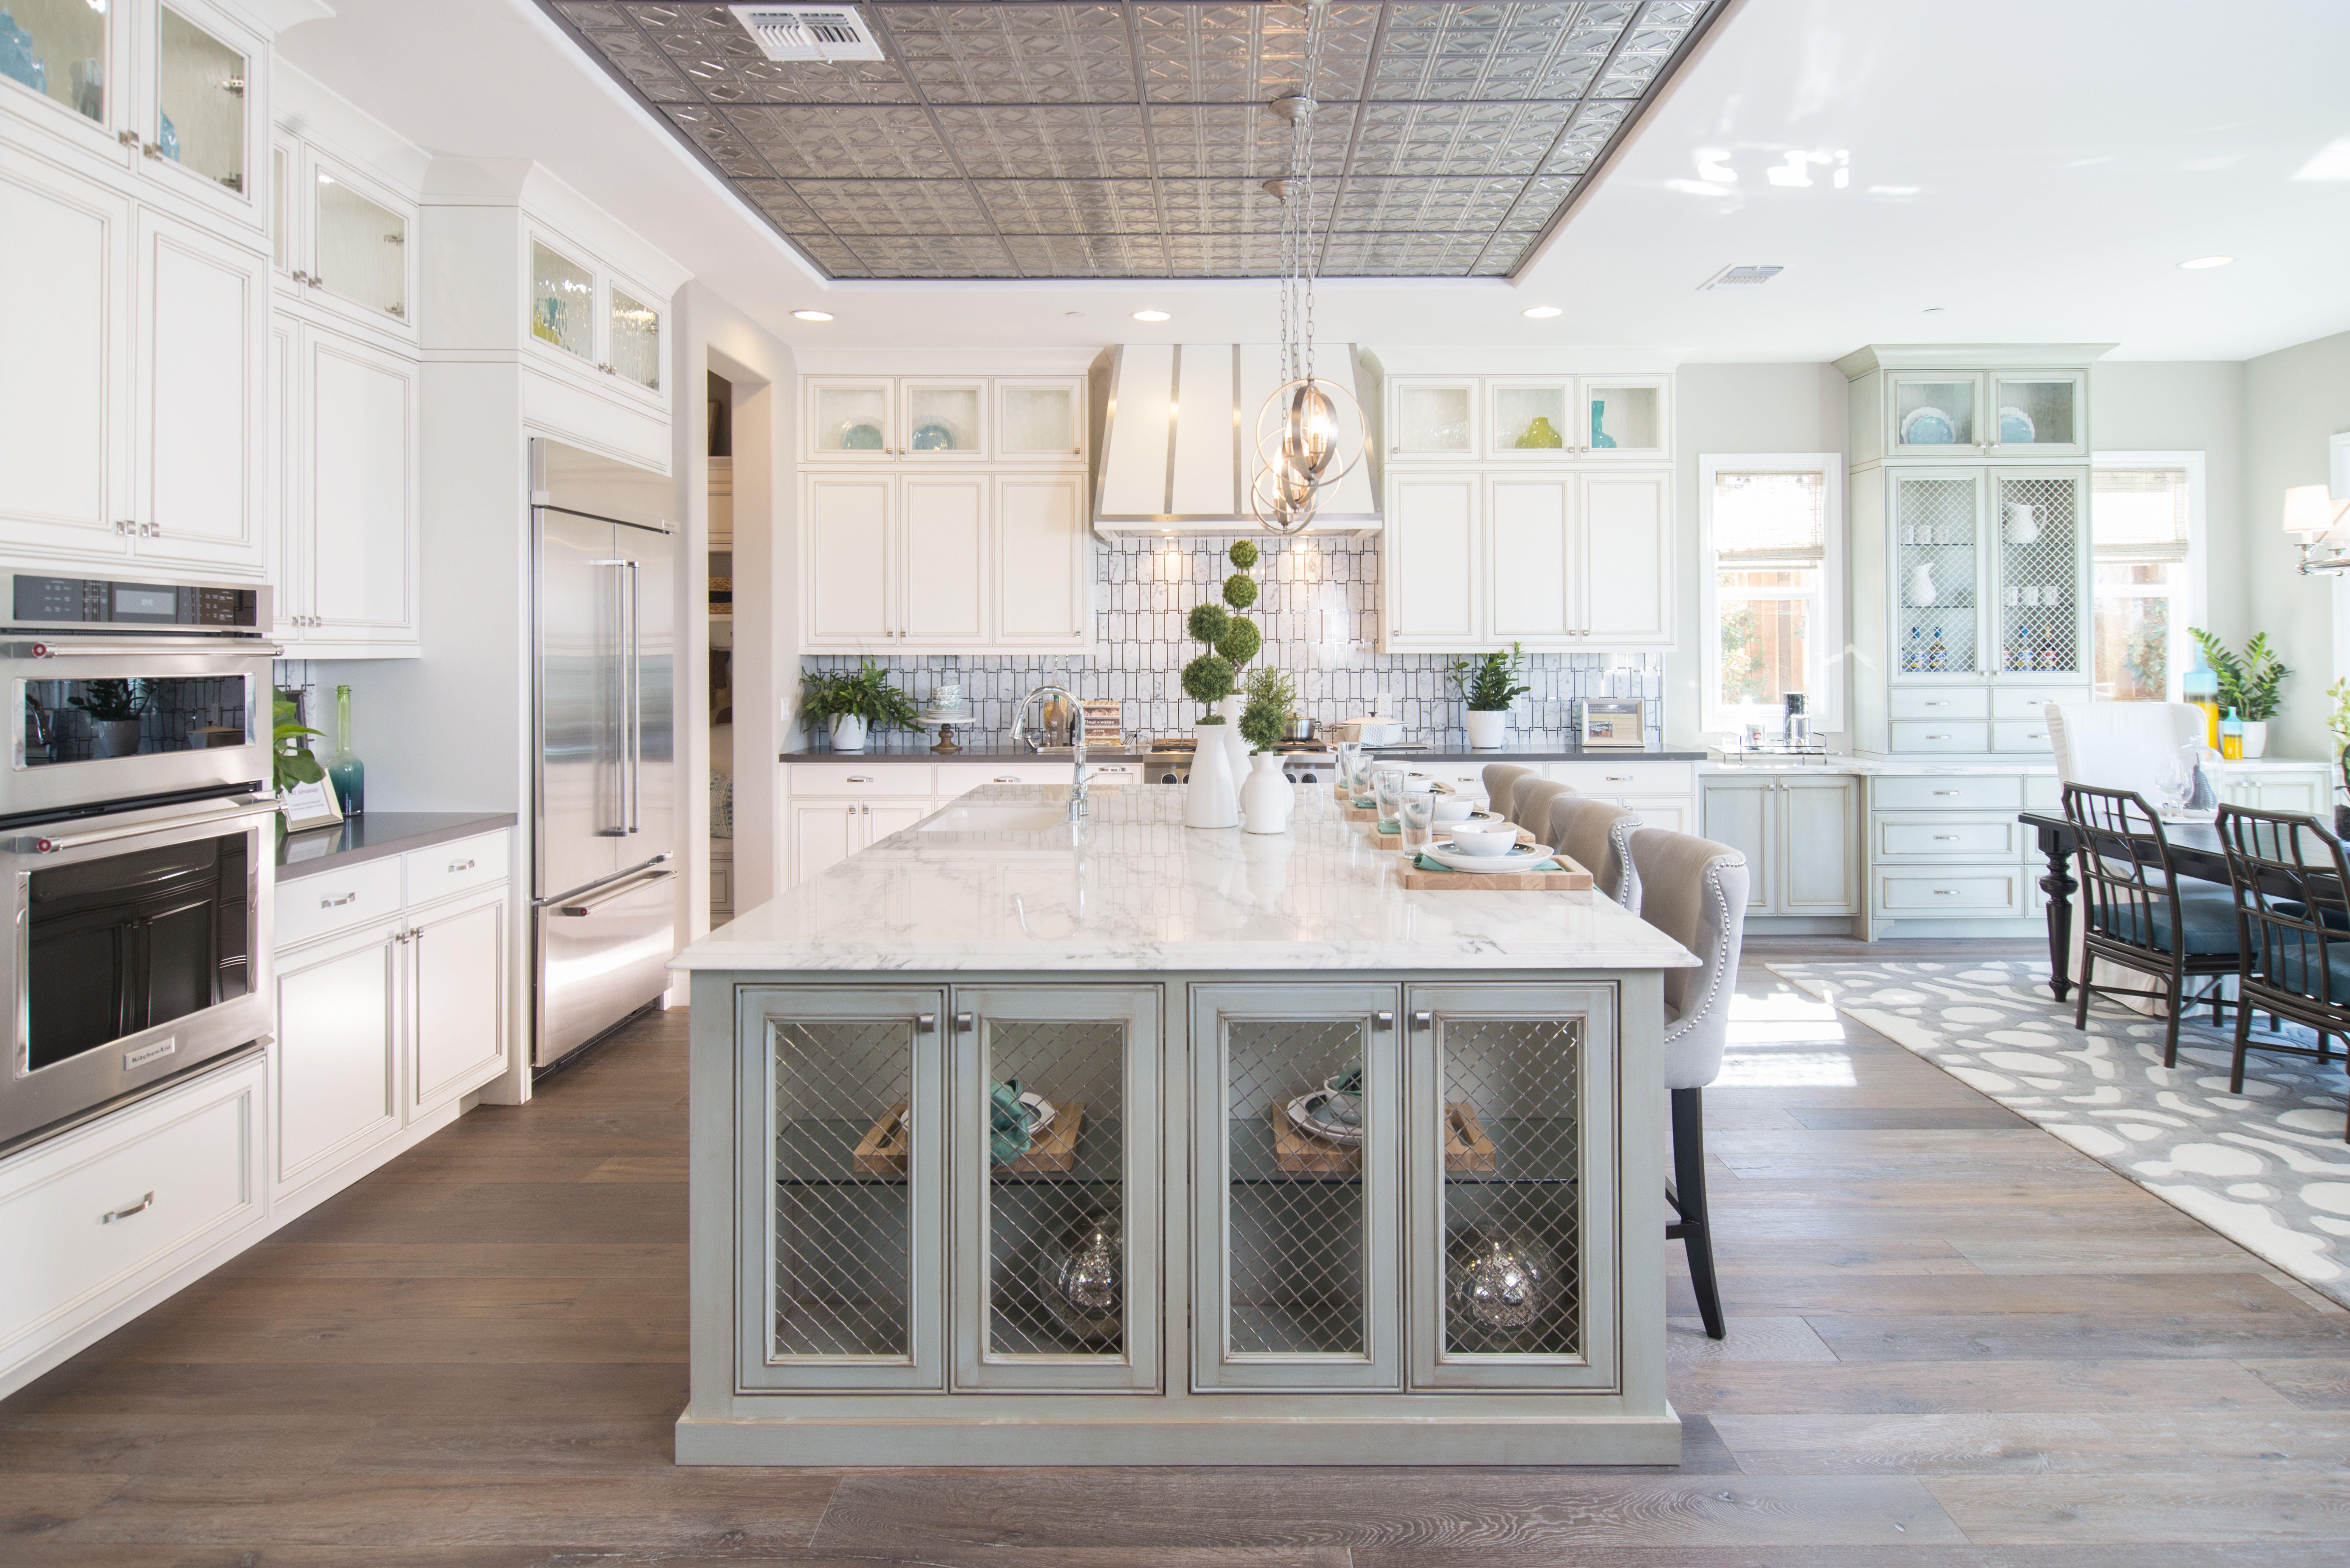 Precision Cabinets Brentwood Ca Traditional Kitchen Kitchen Design Kitchen Cabinet Manufacturers